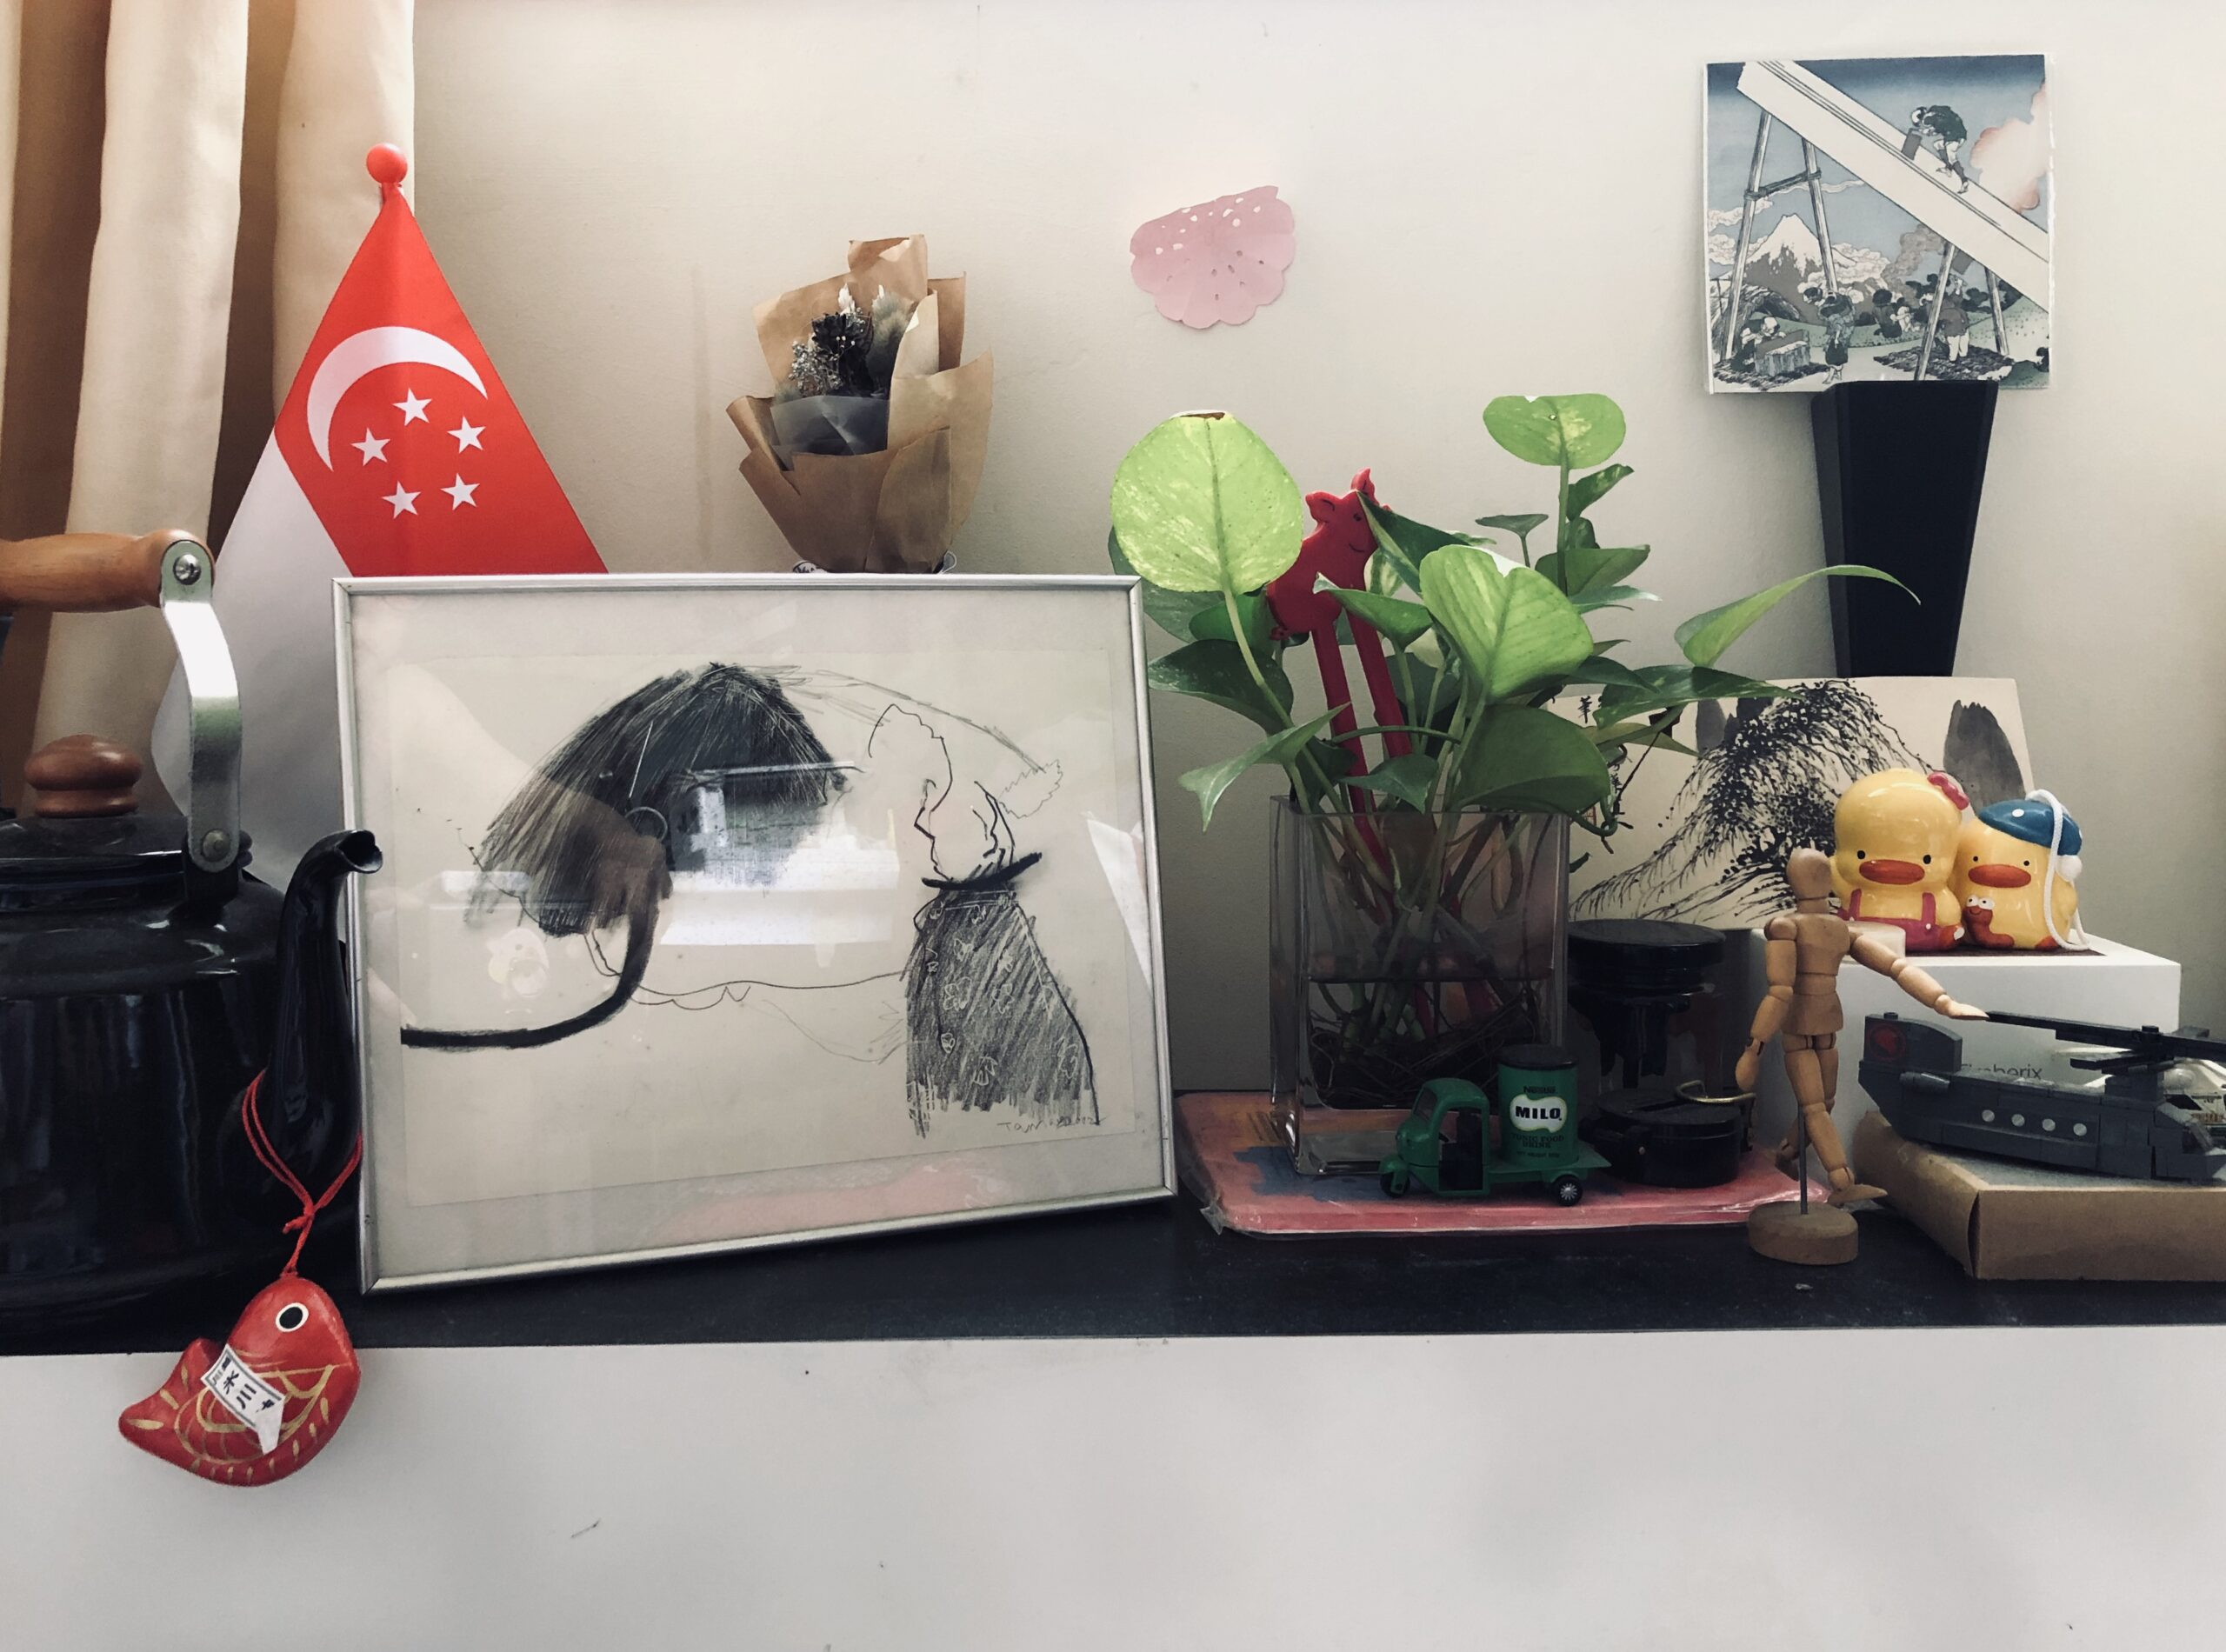 Tang Ling Nah / Artwork Artist Tamares Goh